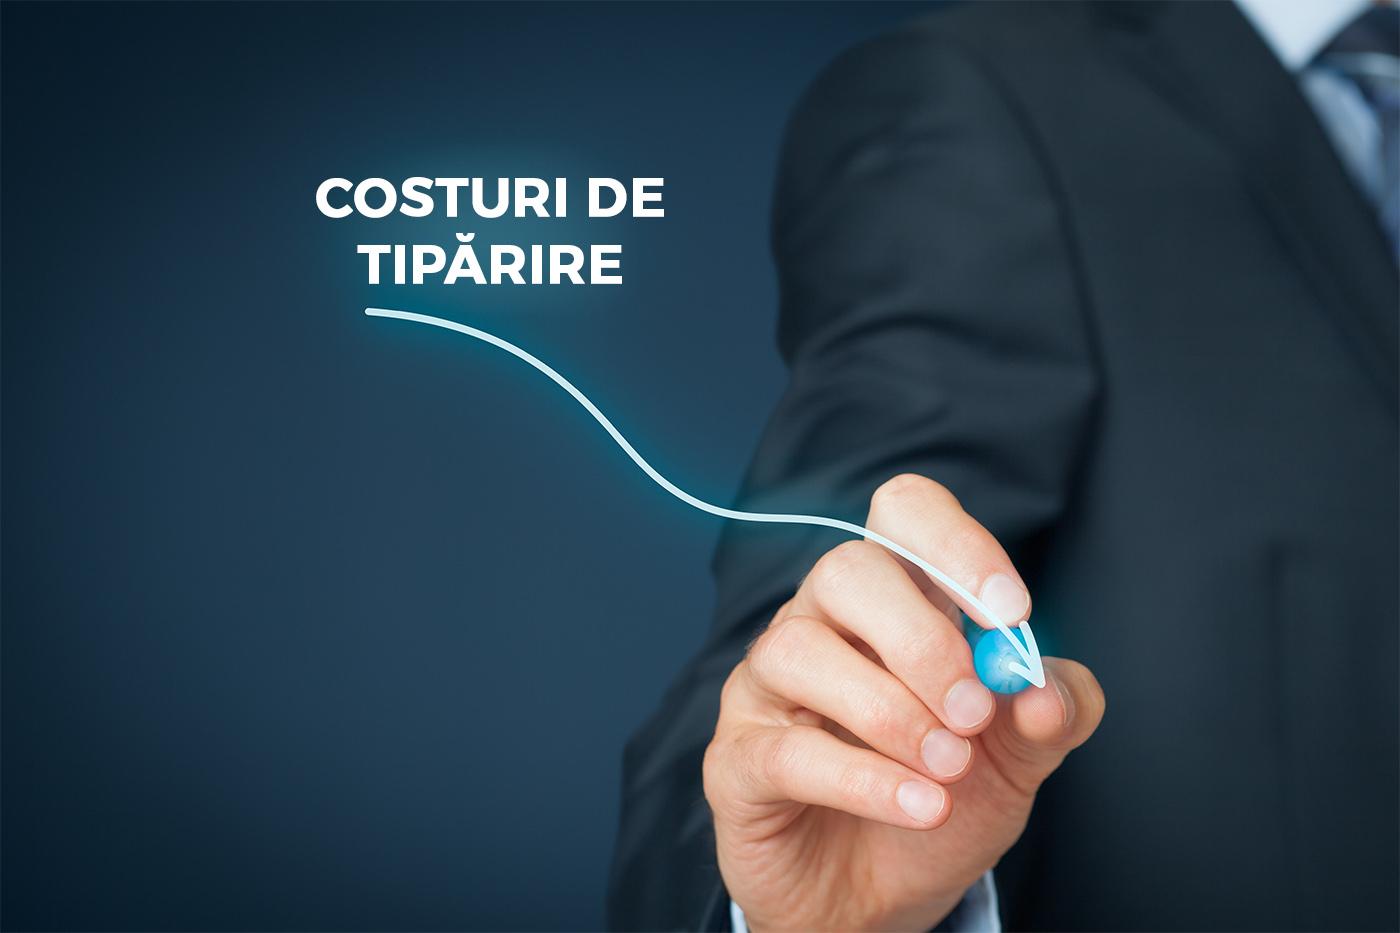 CUM REDUCI COSTURILE DE TIPARIRE?